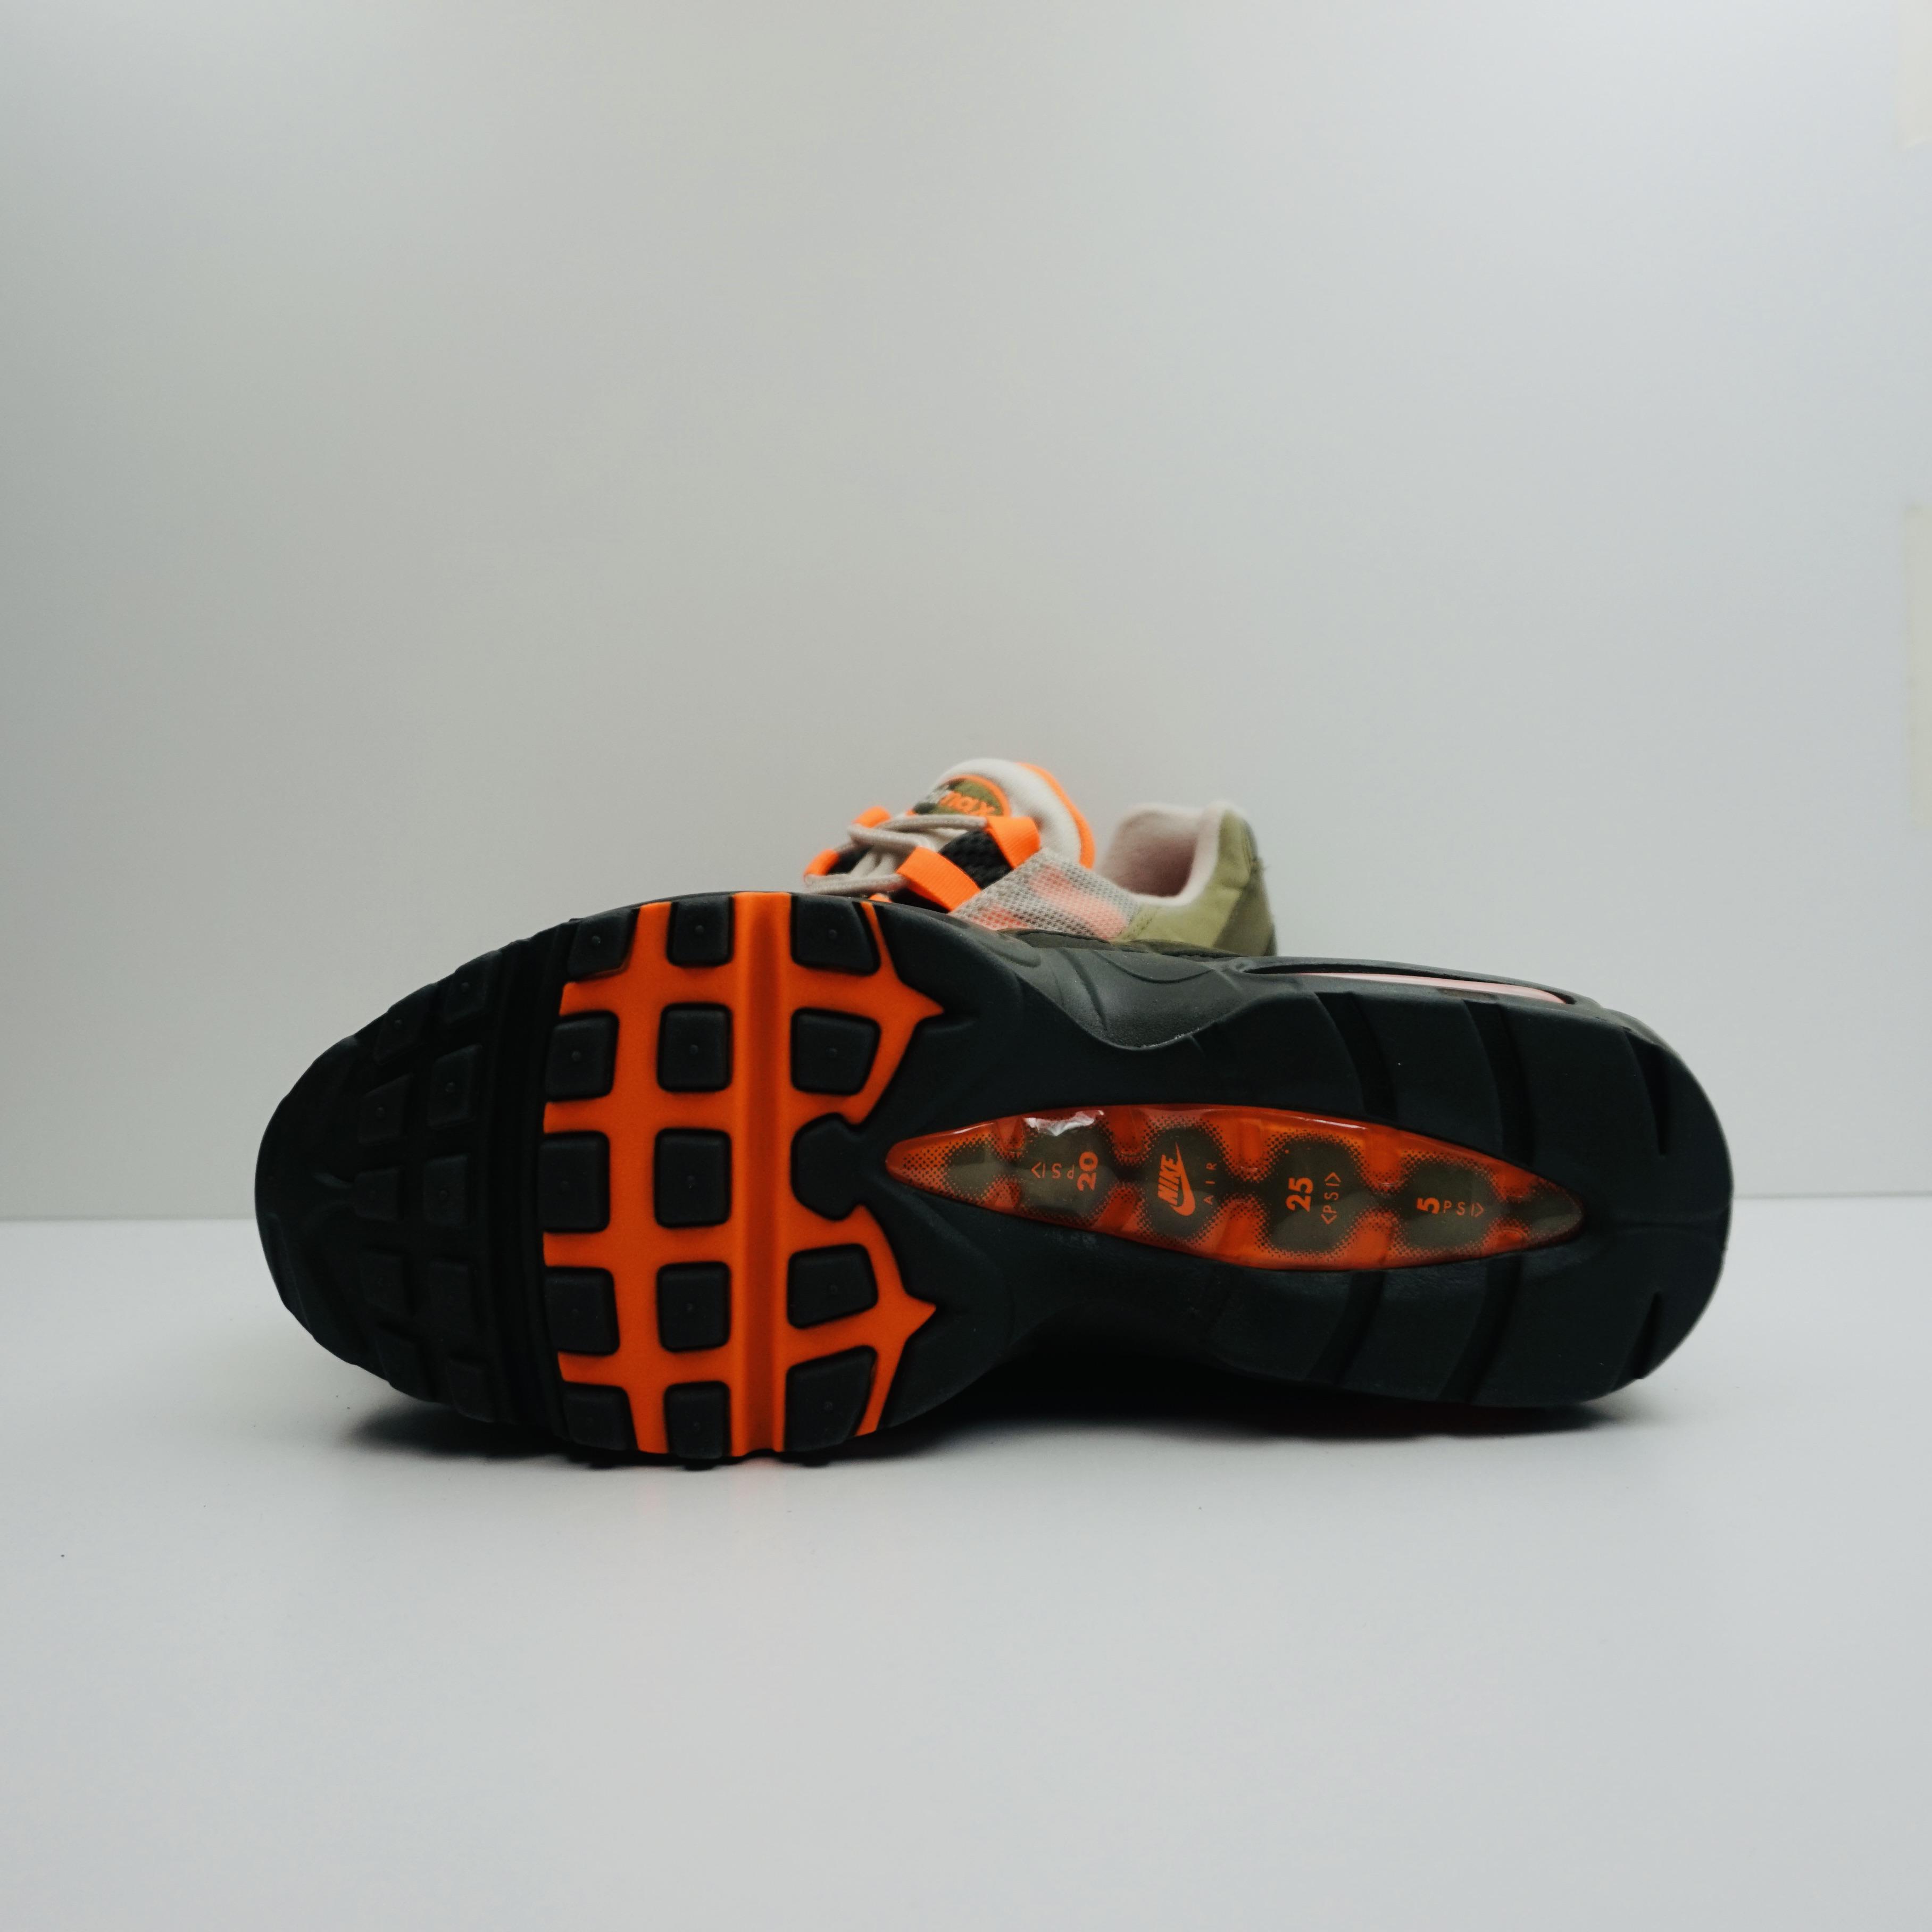 Nike Air Max 95 OG Neutral Olive Total Orange